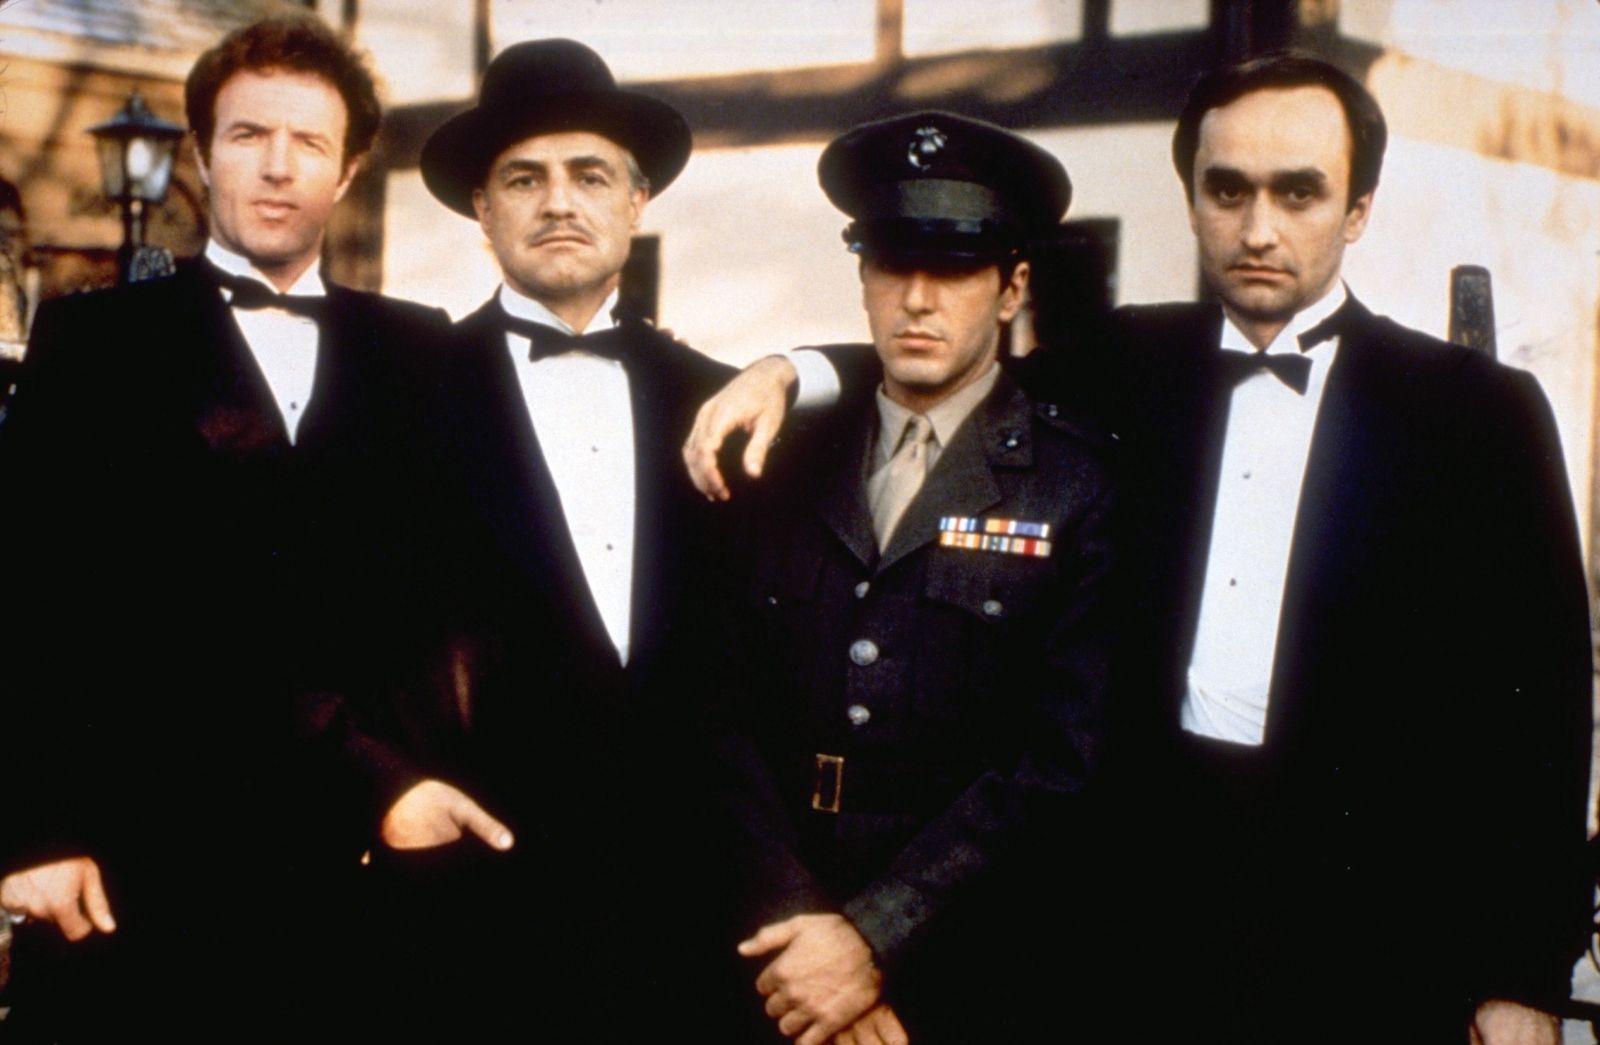 Vľavo James Cann (Sonny Corleone)